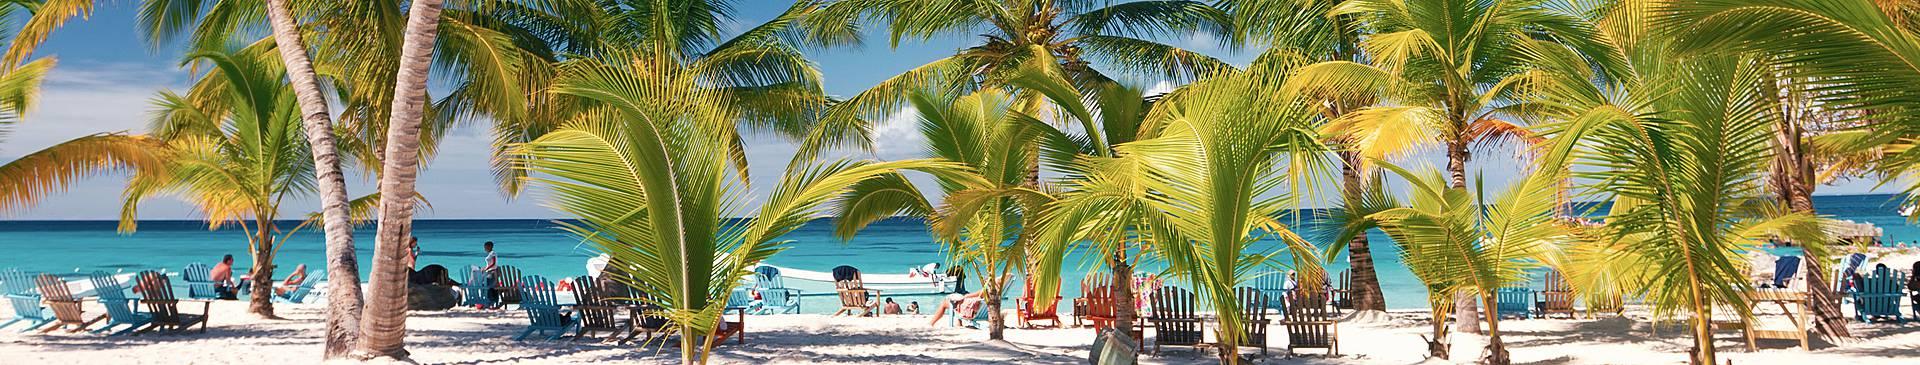 Inseln Dominikanische Republik Reisen